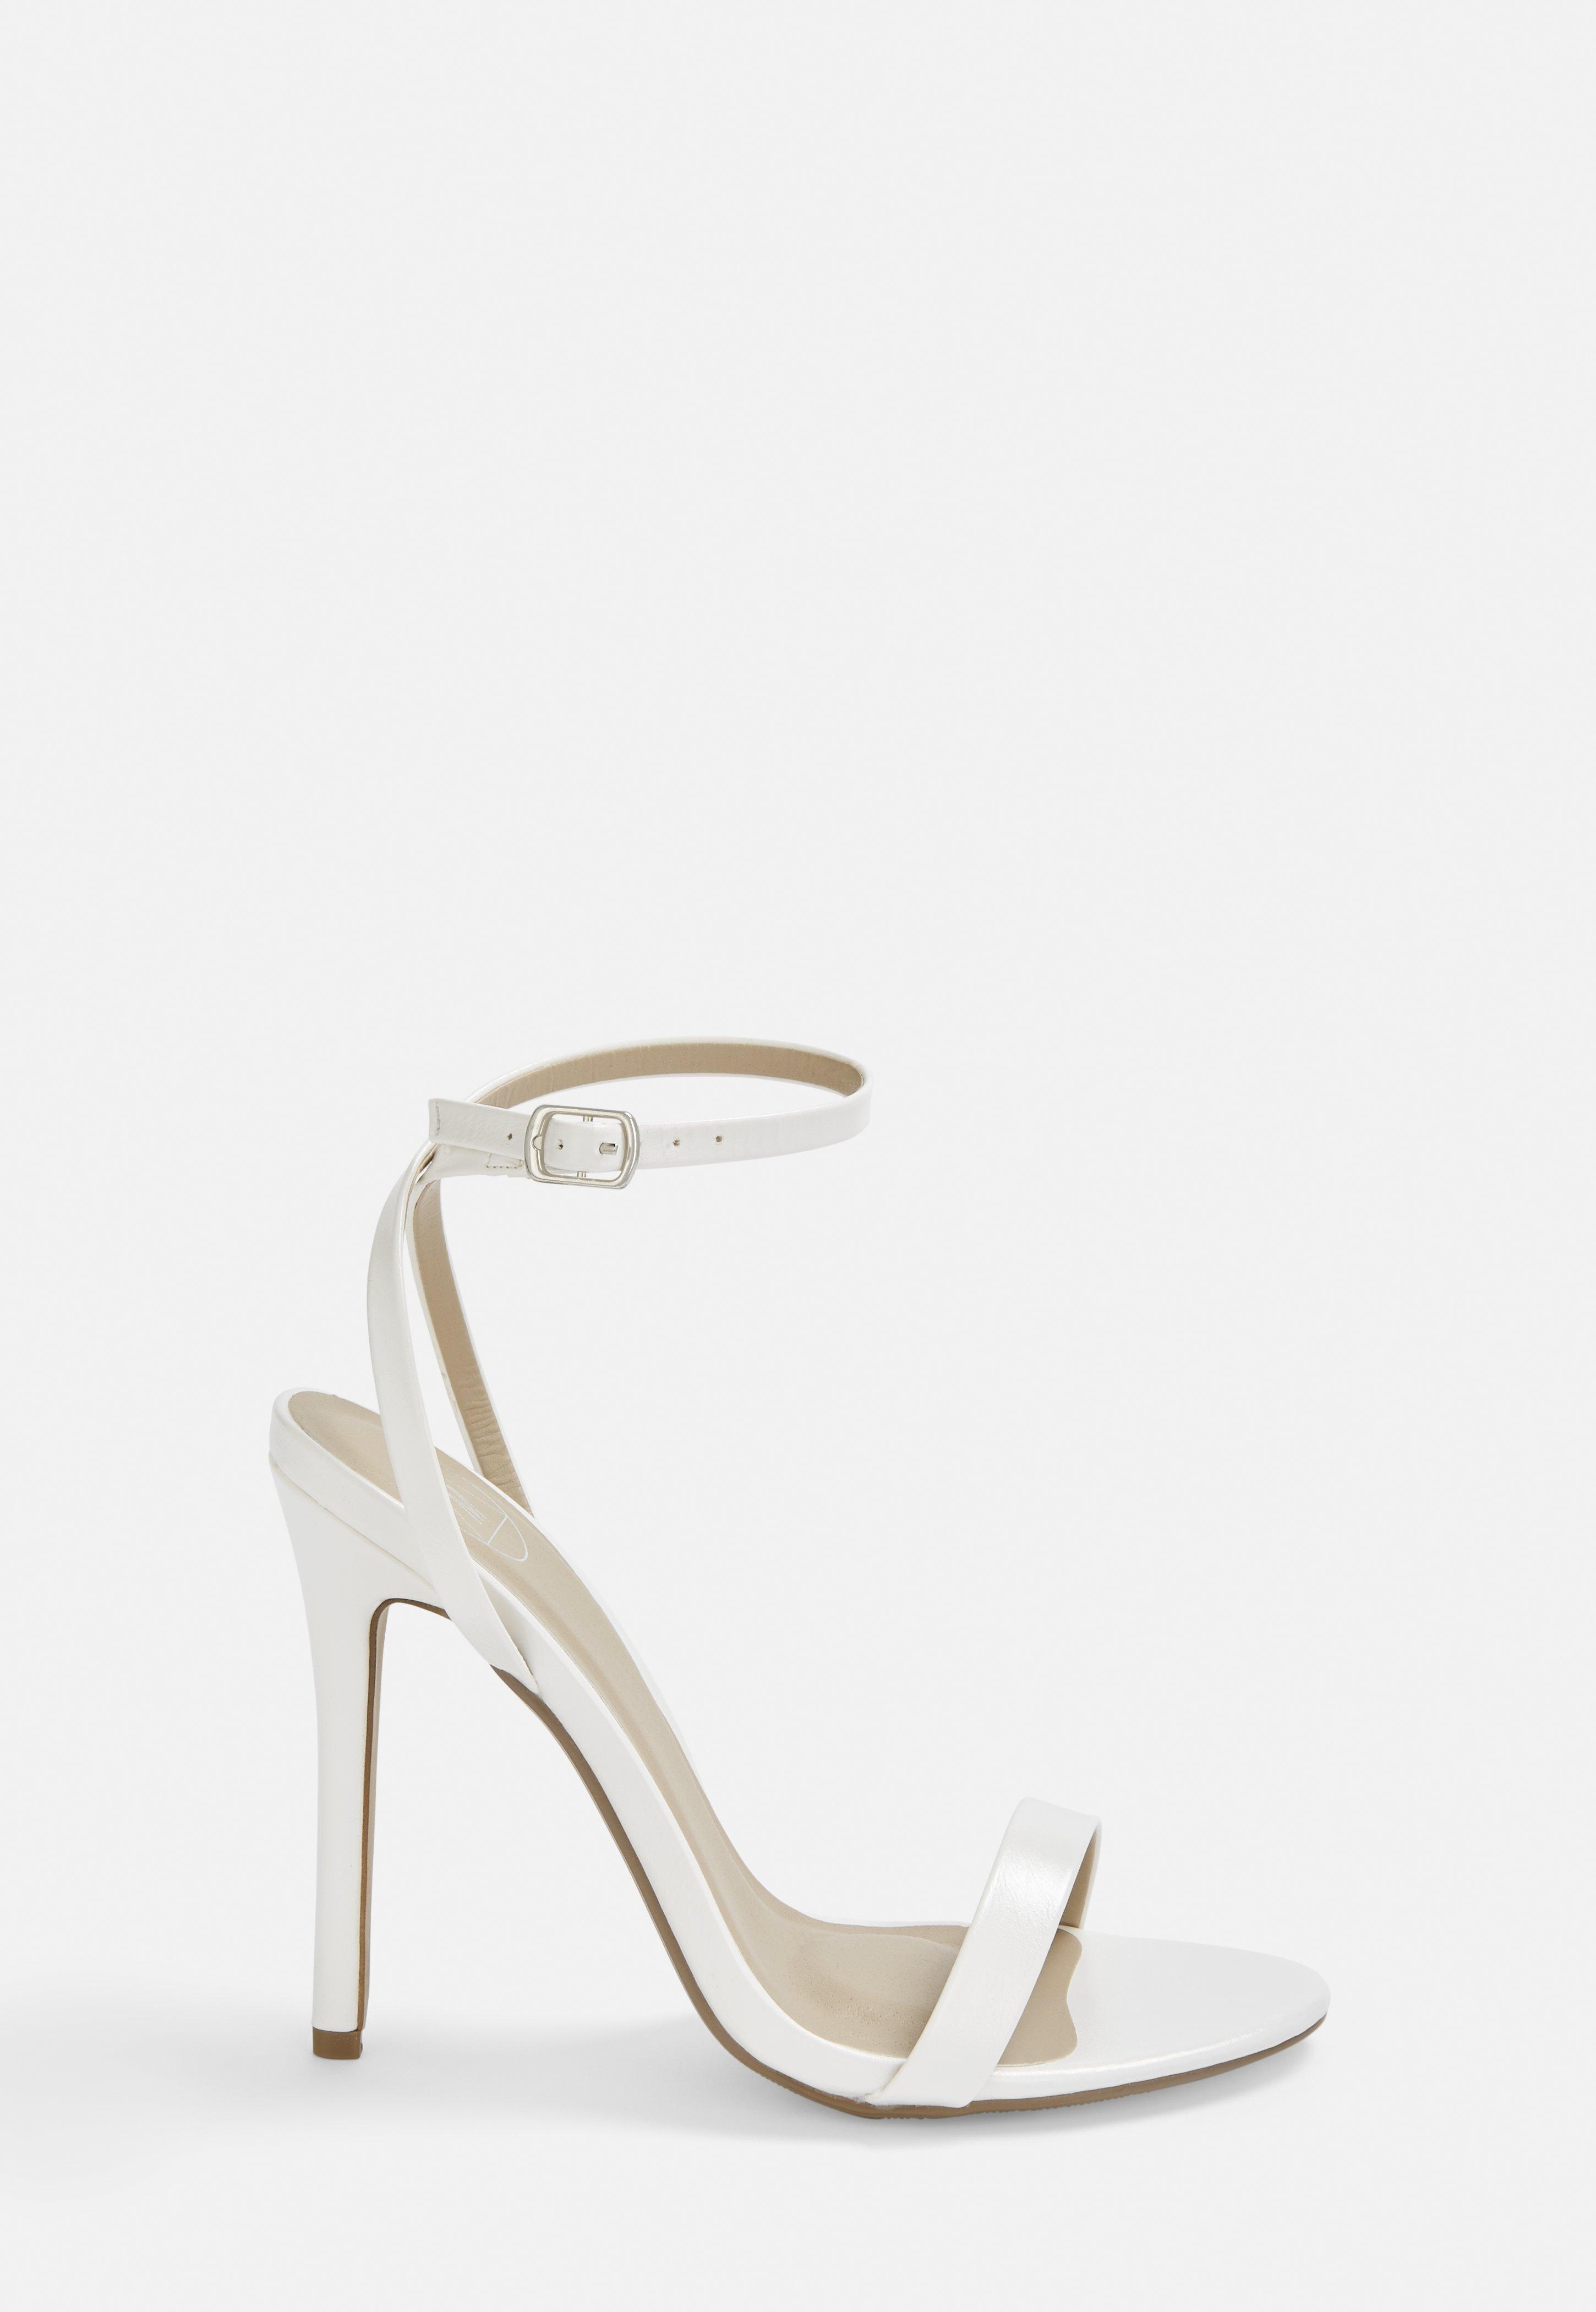 wedding sandal,White block heel,Wedding shoes,White sandals,Block heel sandals,Wedding heels,Bridesmaids shoes,Ivory bride sandals Mia